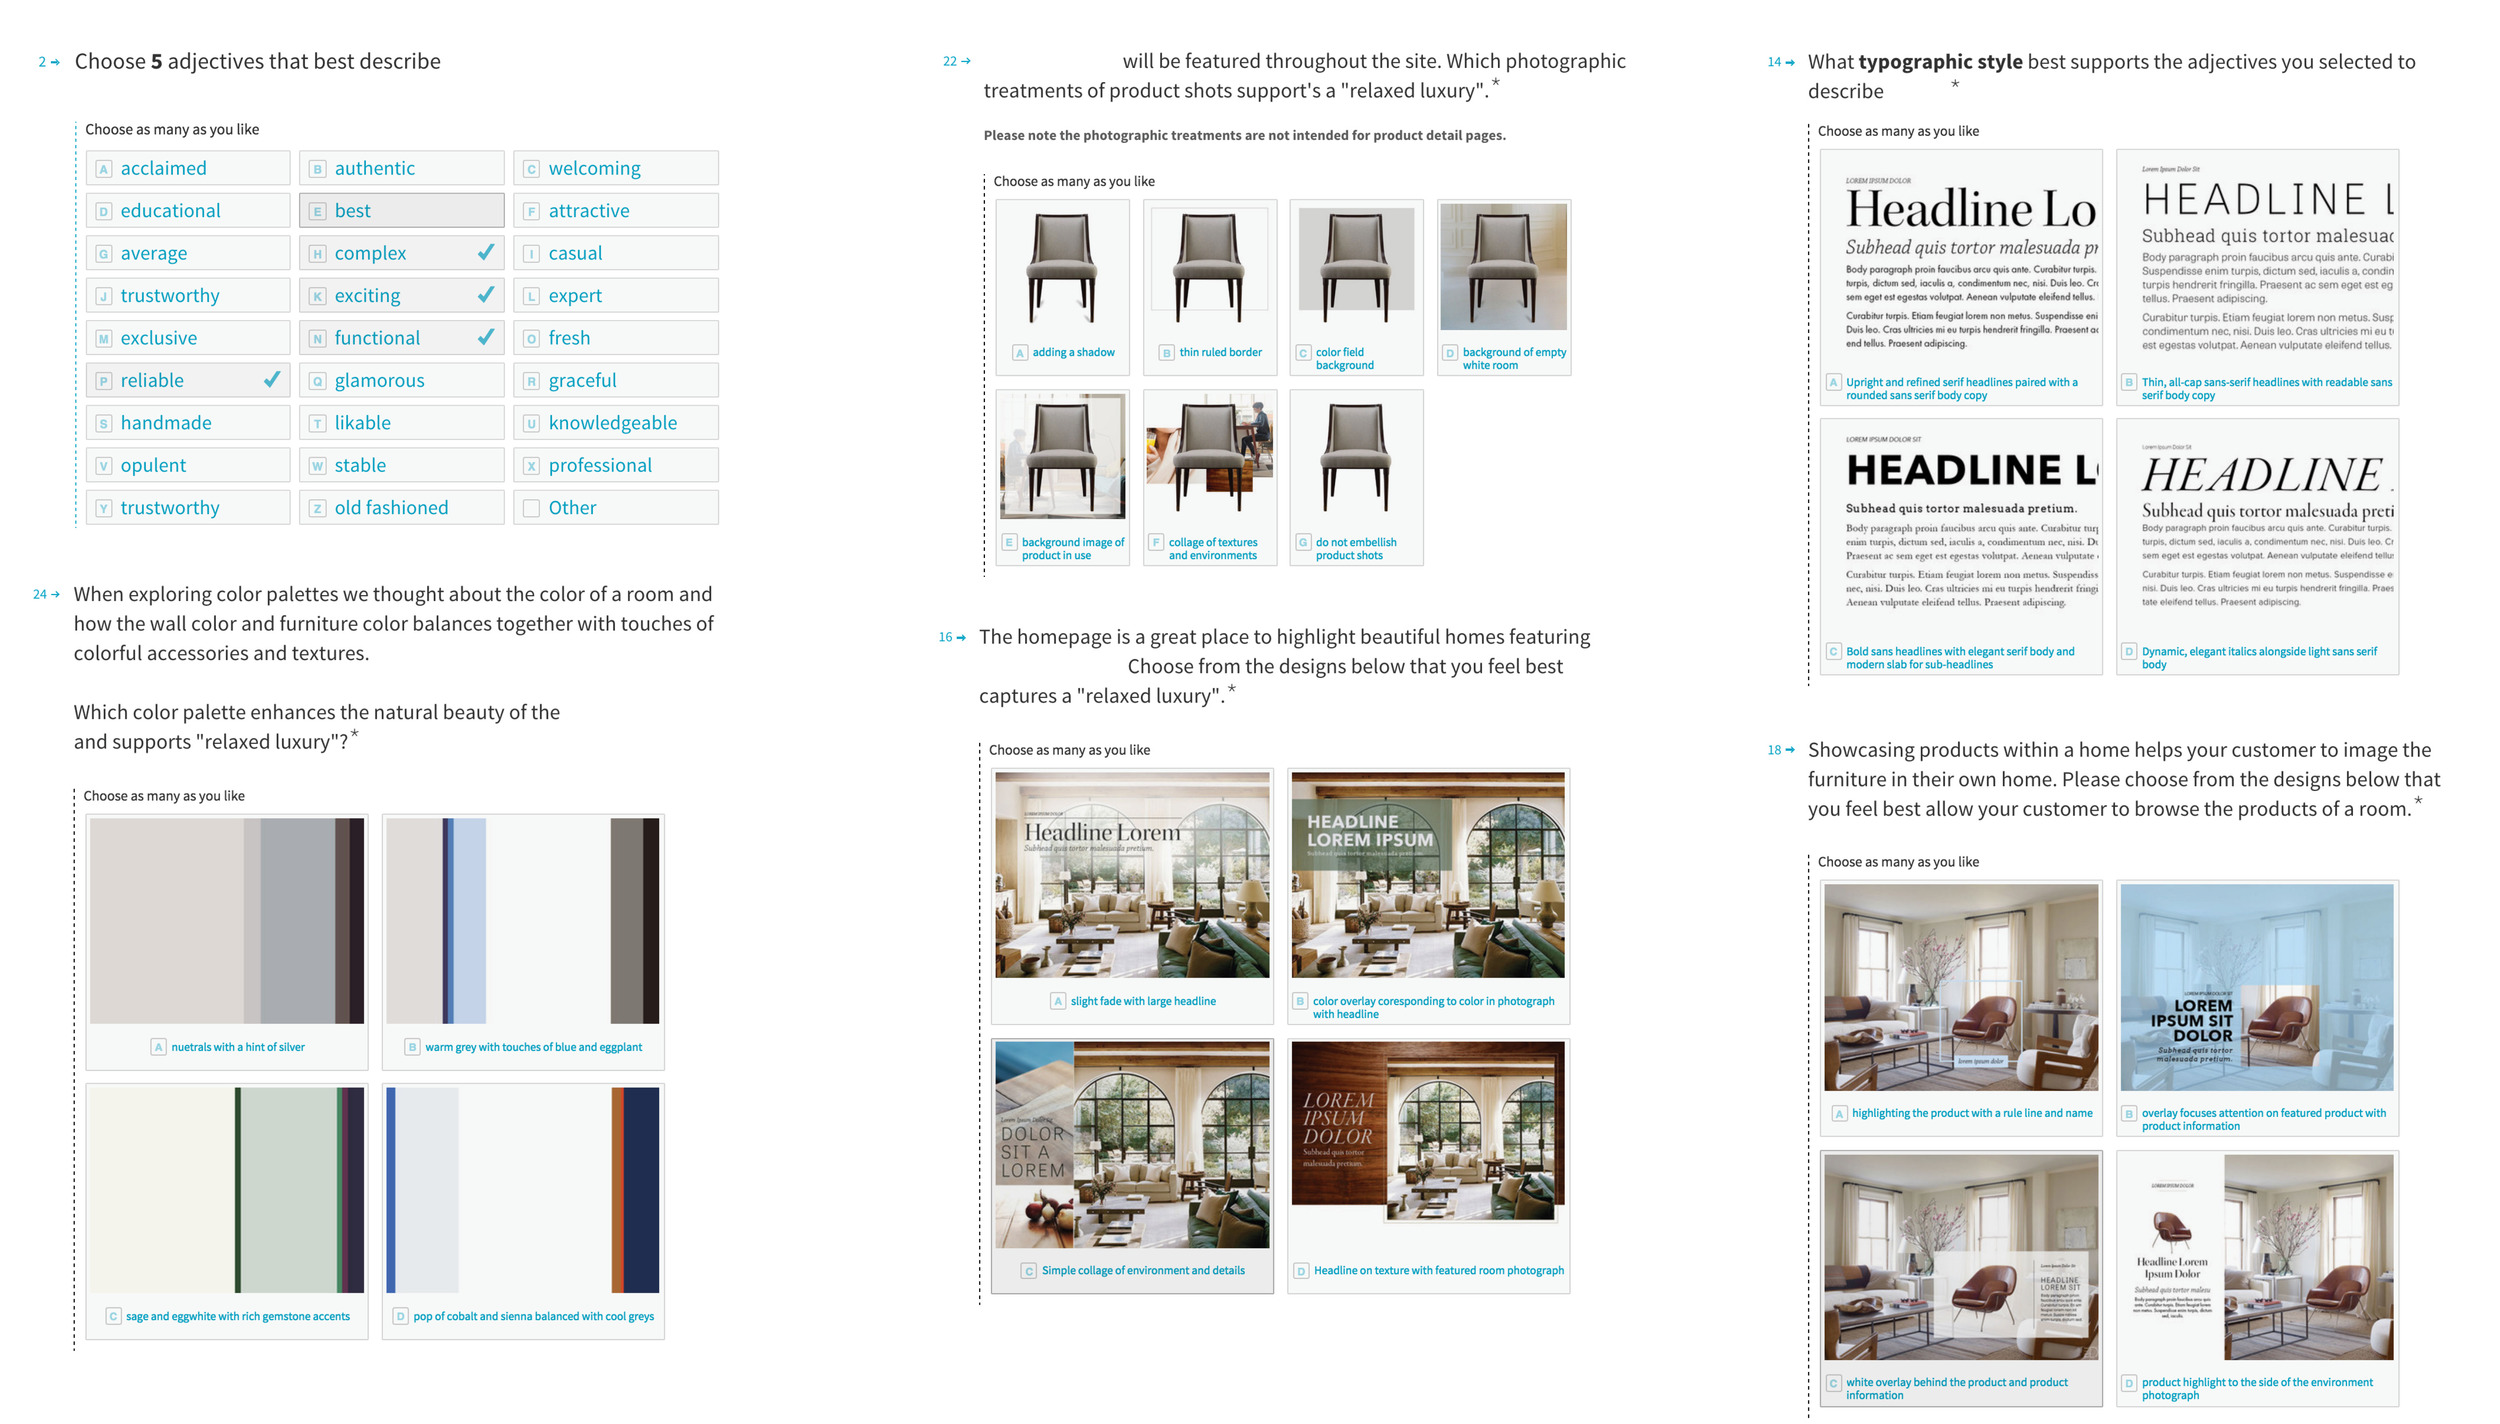 furniture_survey.jpg